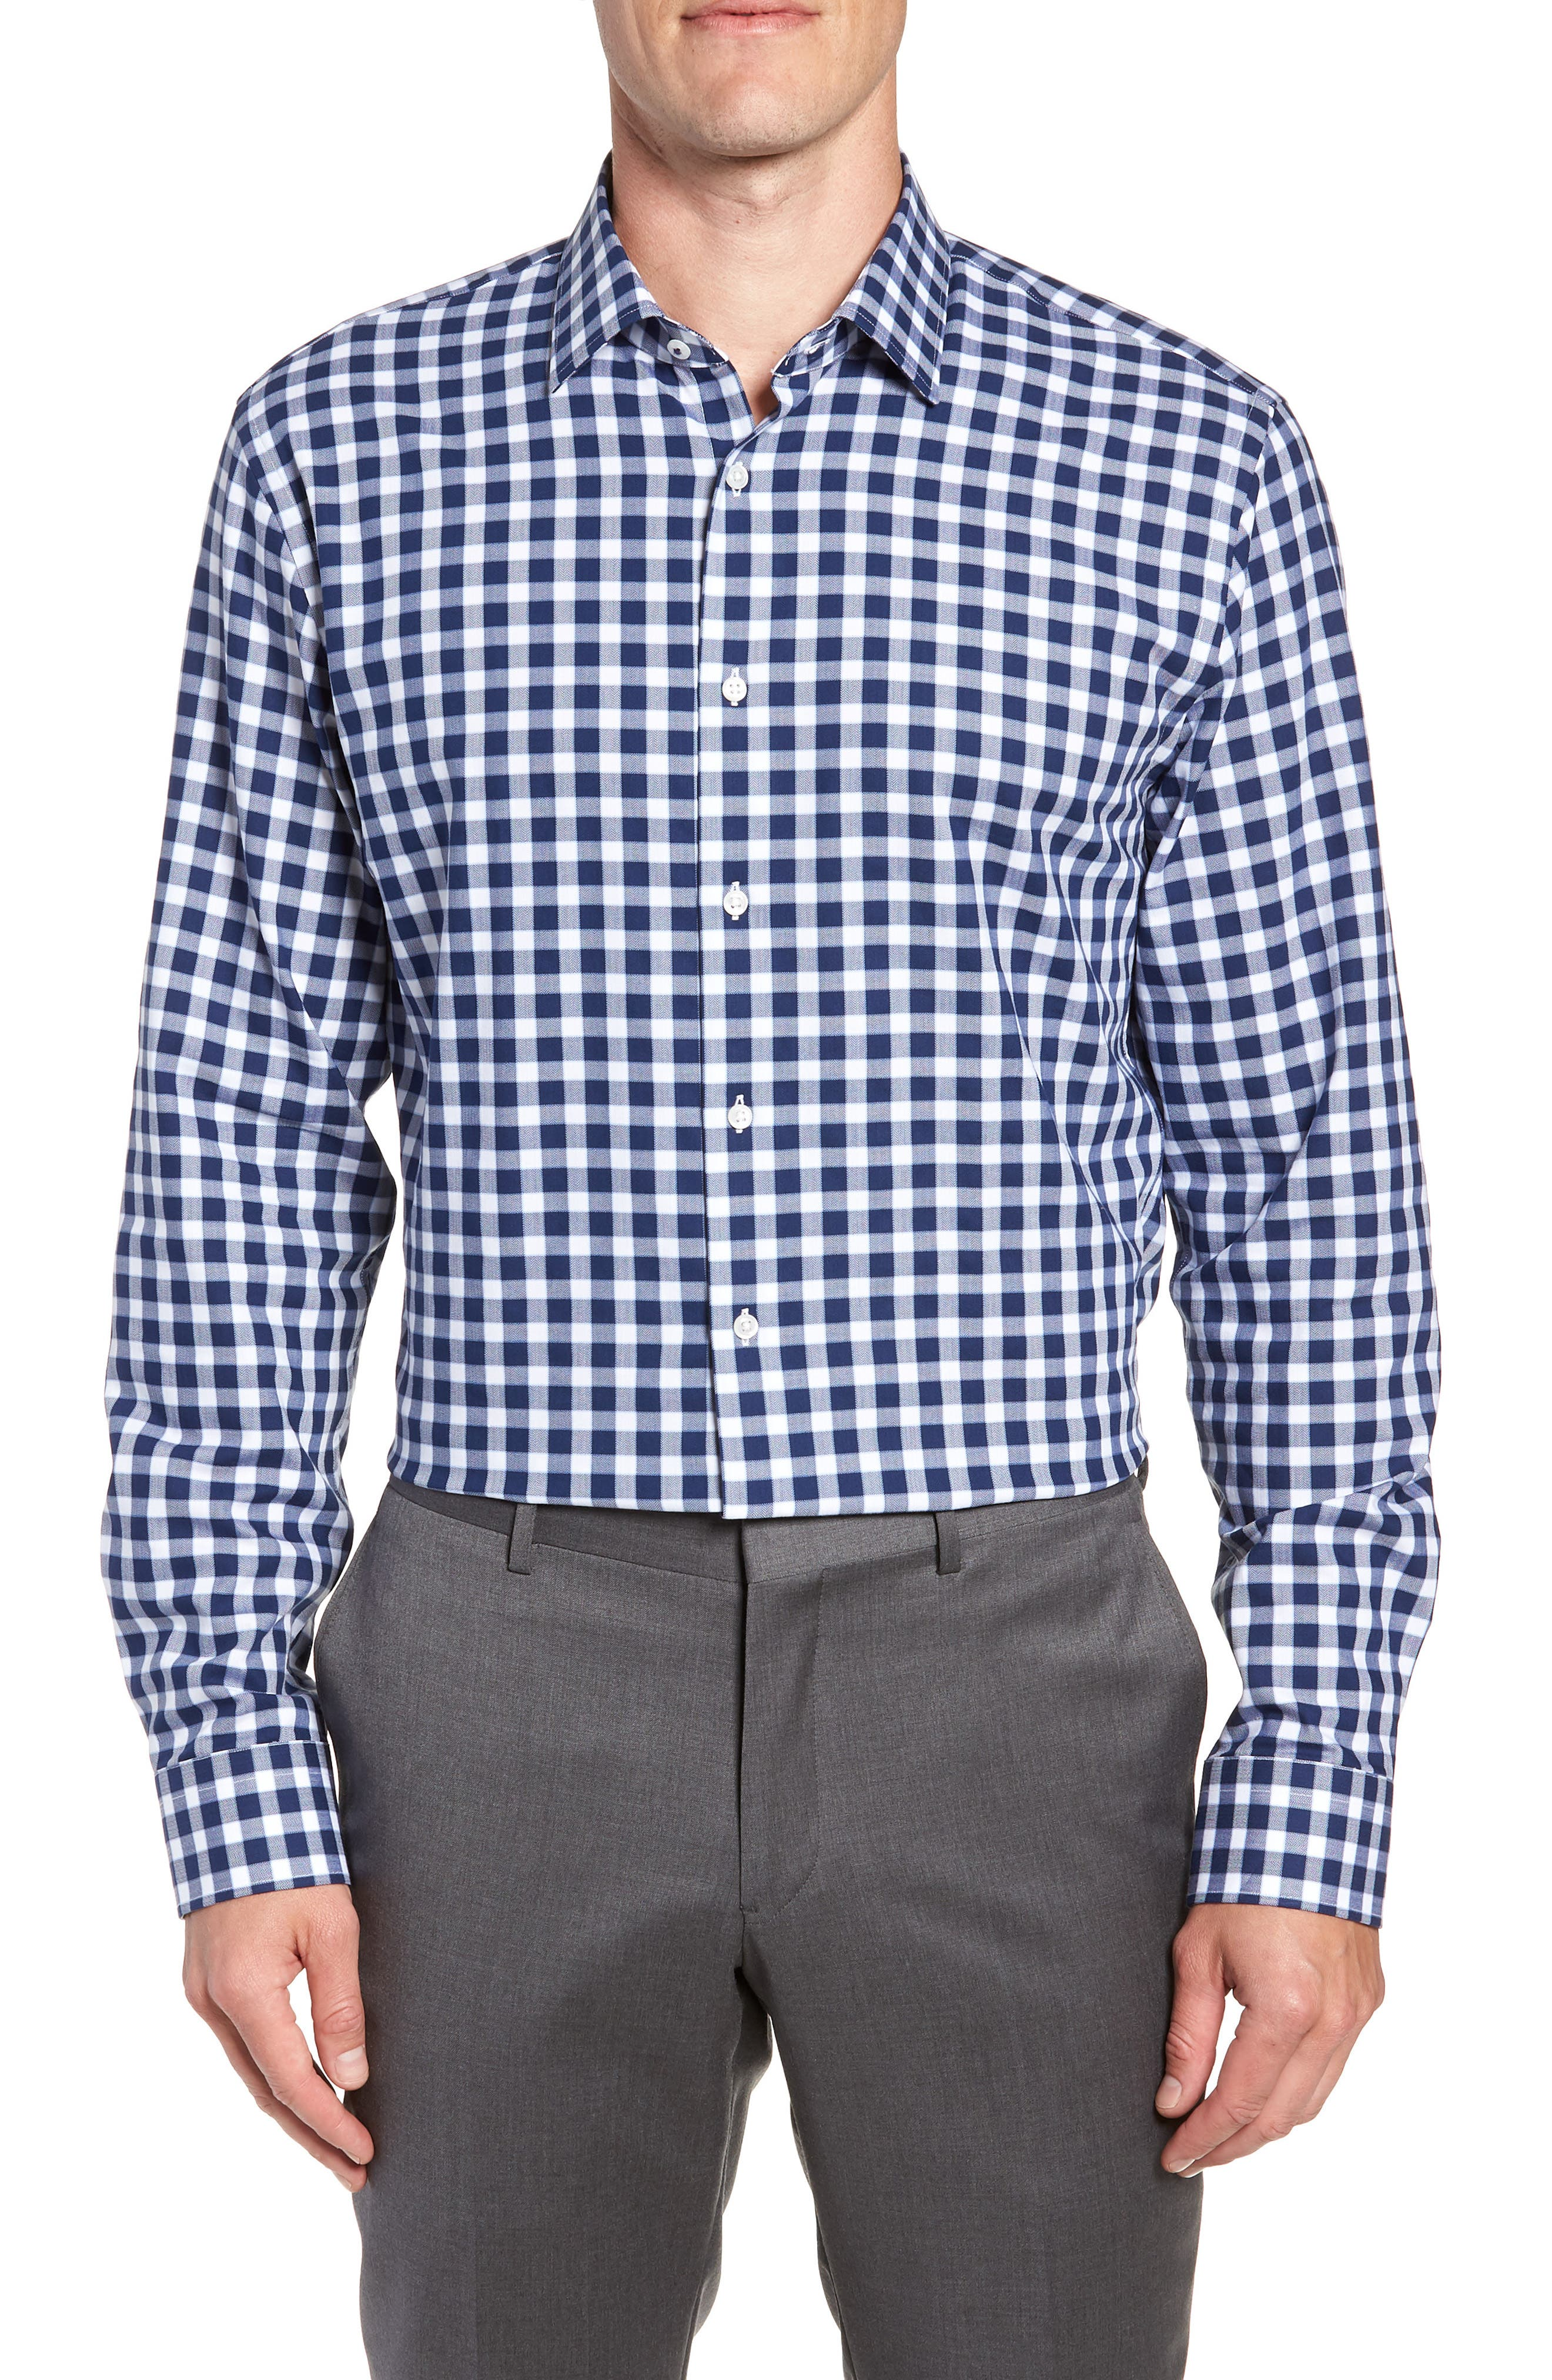 Tech-Smart Trim Fit Stretch Check Dress Shirt,                             Main thumbnail 1, color,                             NAVY PEACOAT